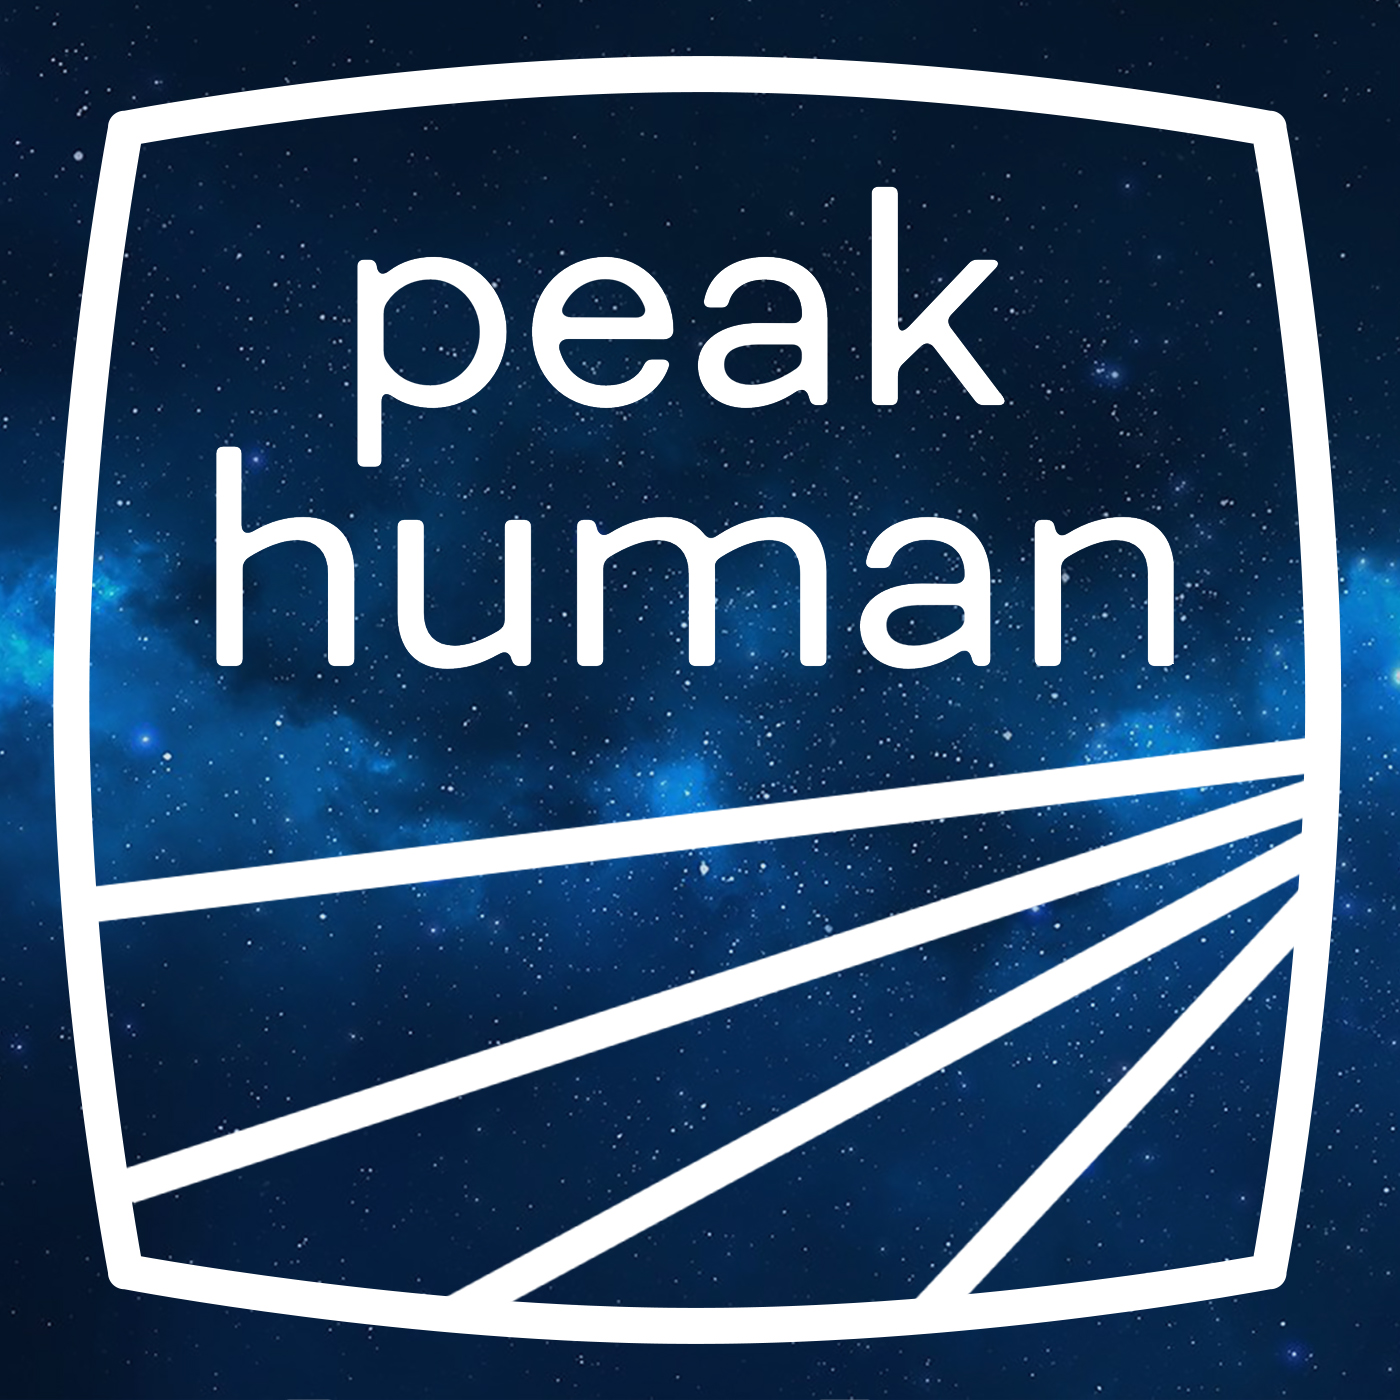 Peak Human - Unbiased Nutrition Info for Optimum Health, Fitness & Living show art